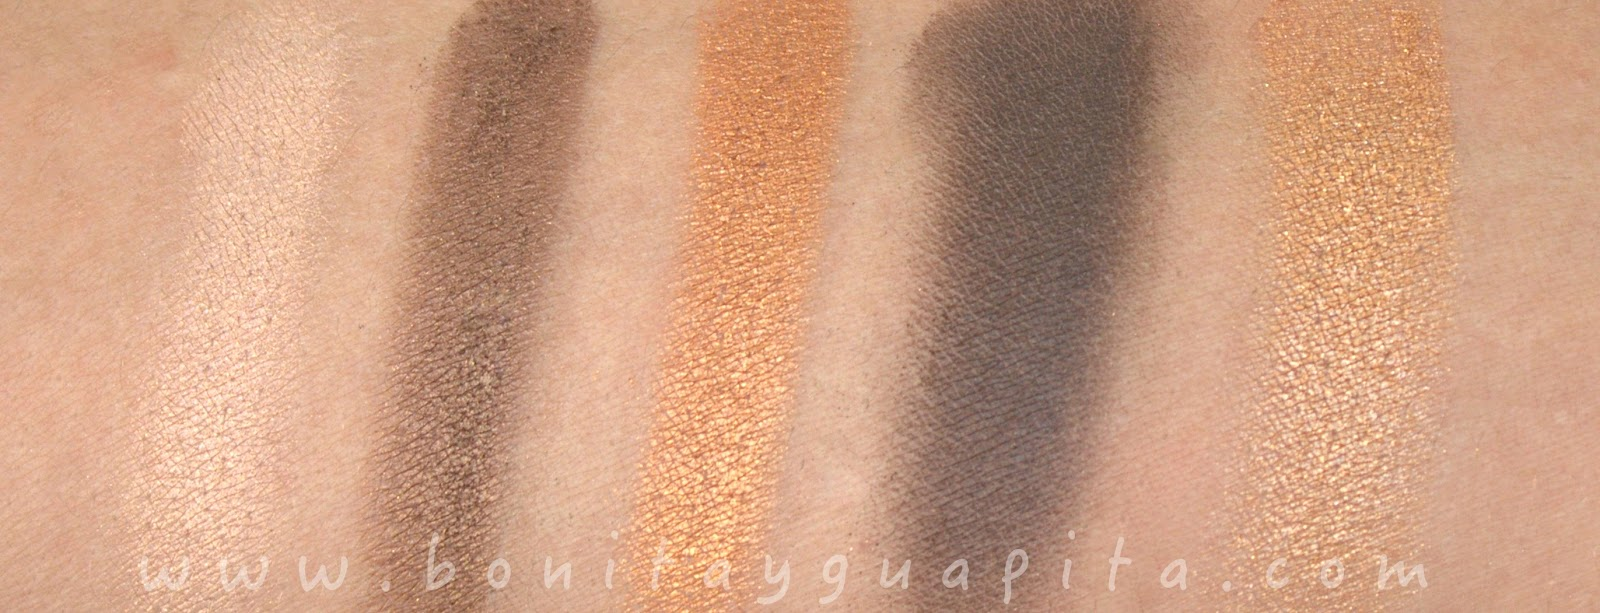 smokey eye palette deborah milano 01 nude